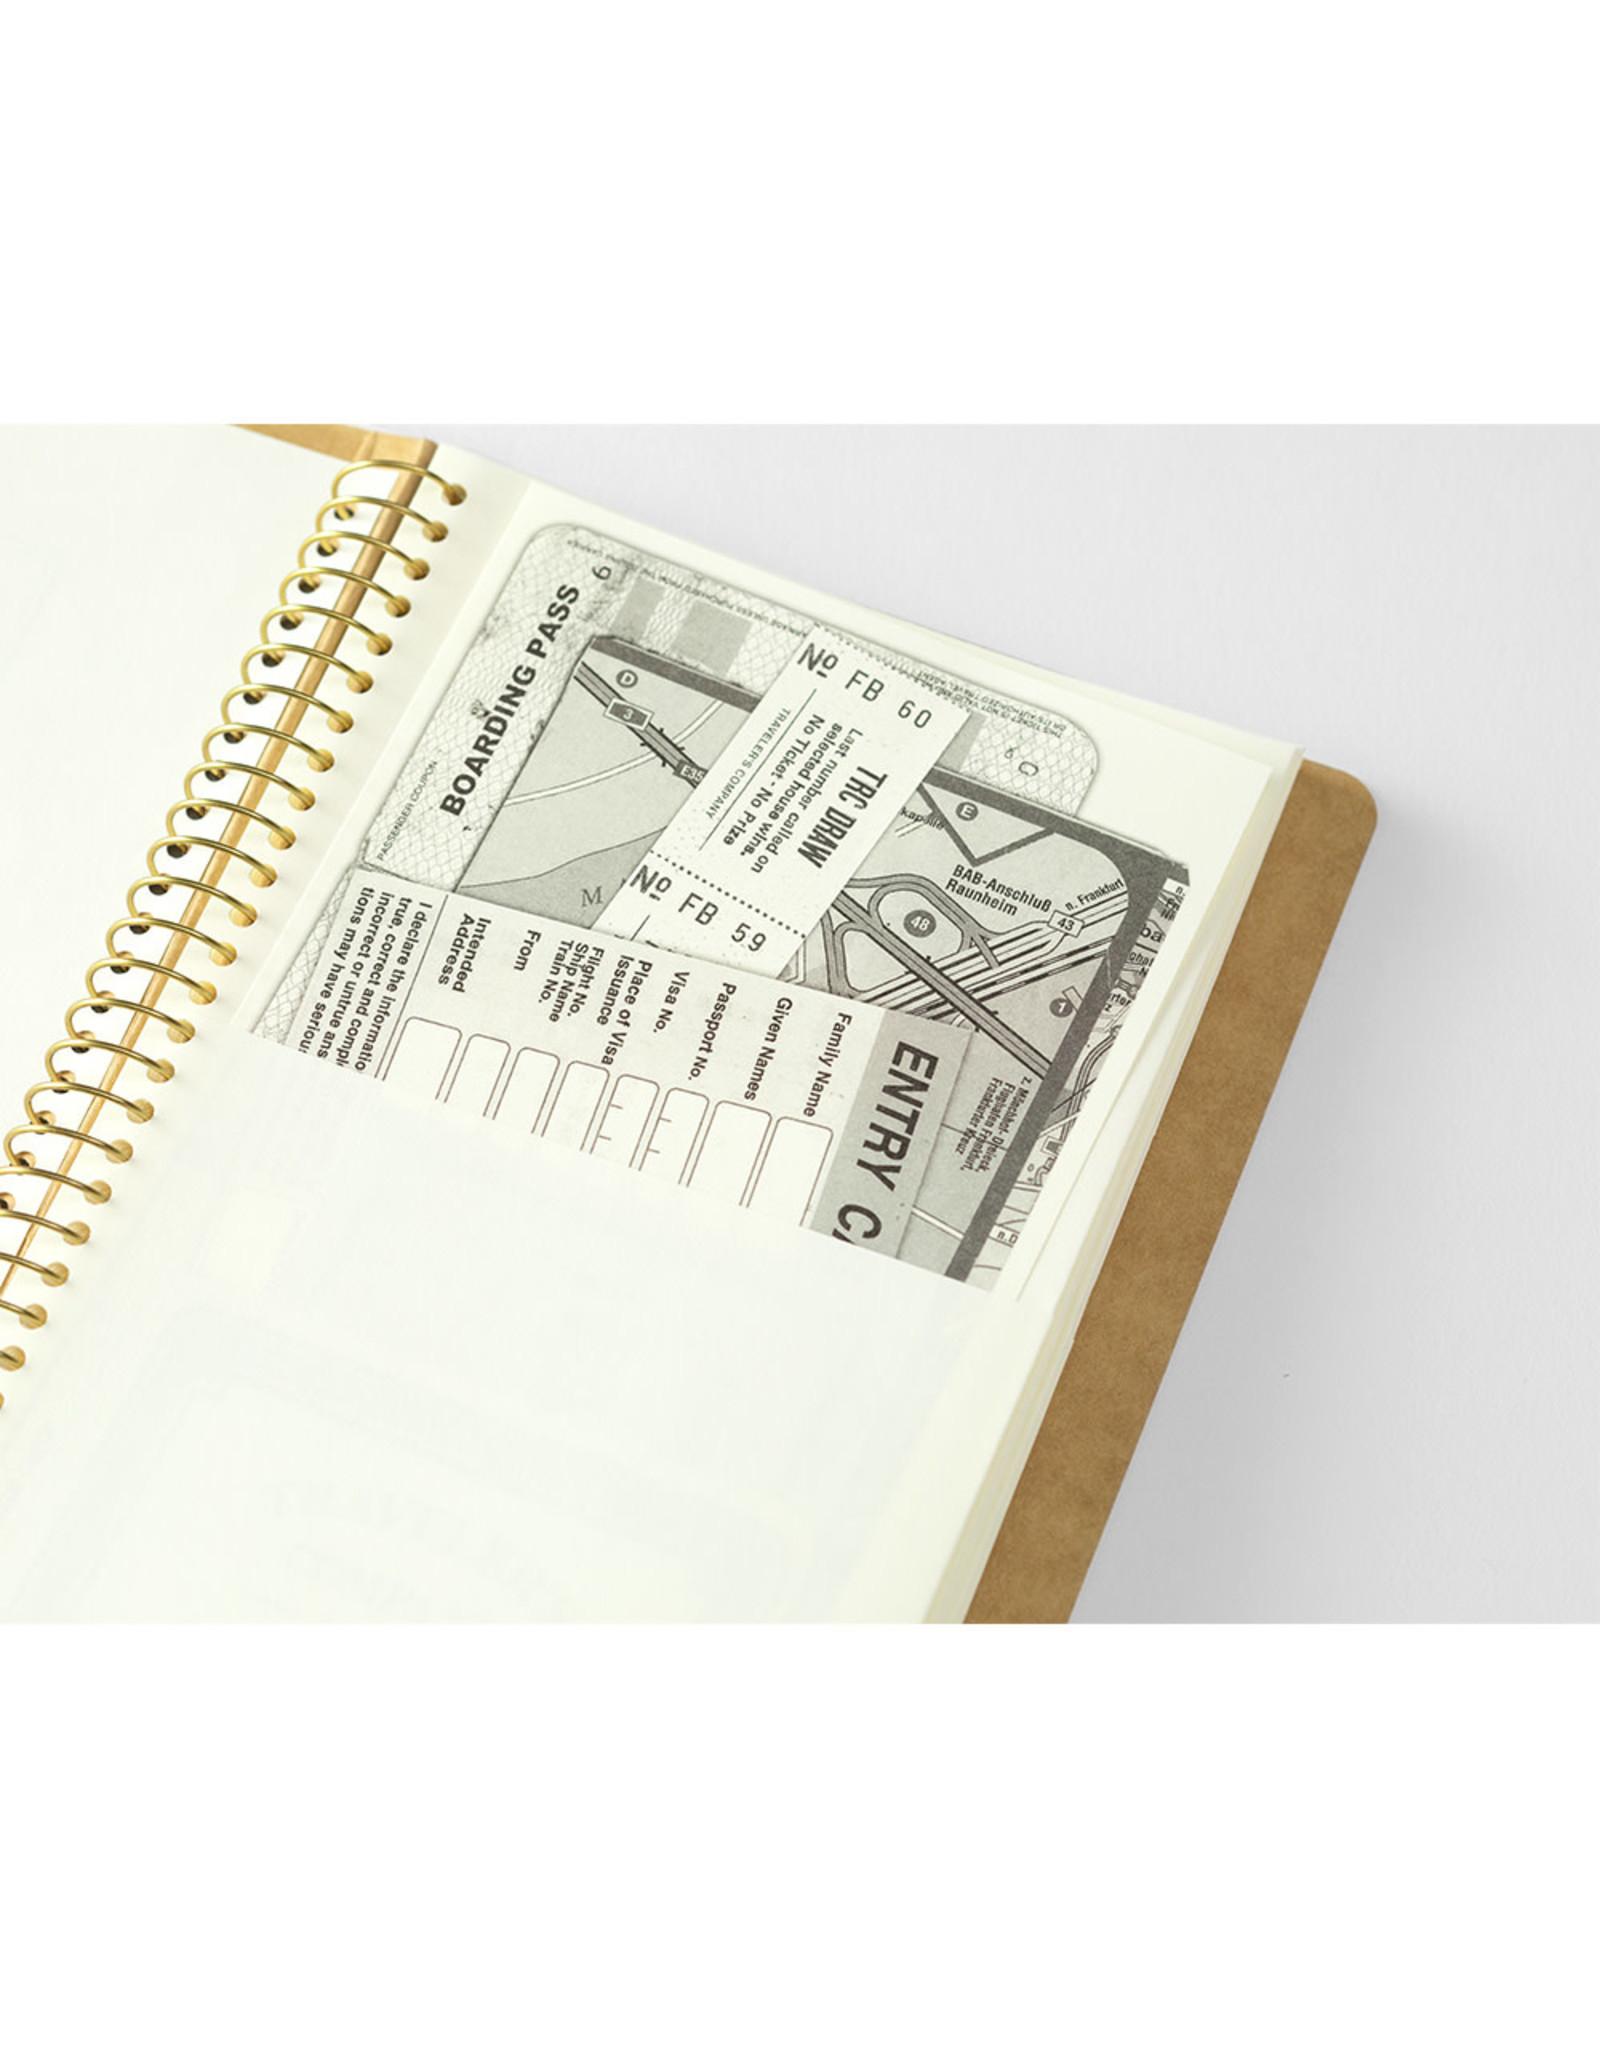 Traveler's Company SPIRAL RING NOTEBOOK A5 SLIM PAPER POCKET 16 SHEETS (32 POCKETS)